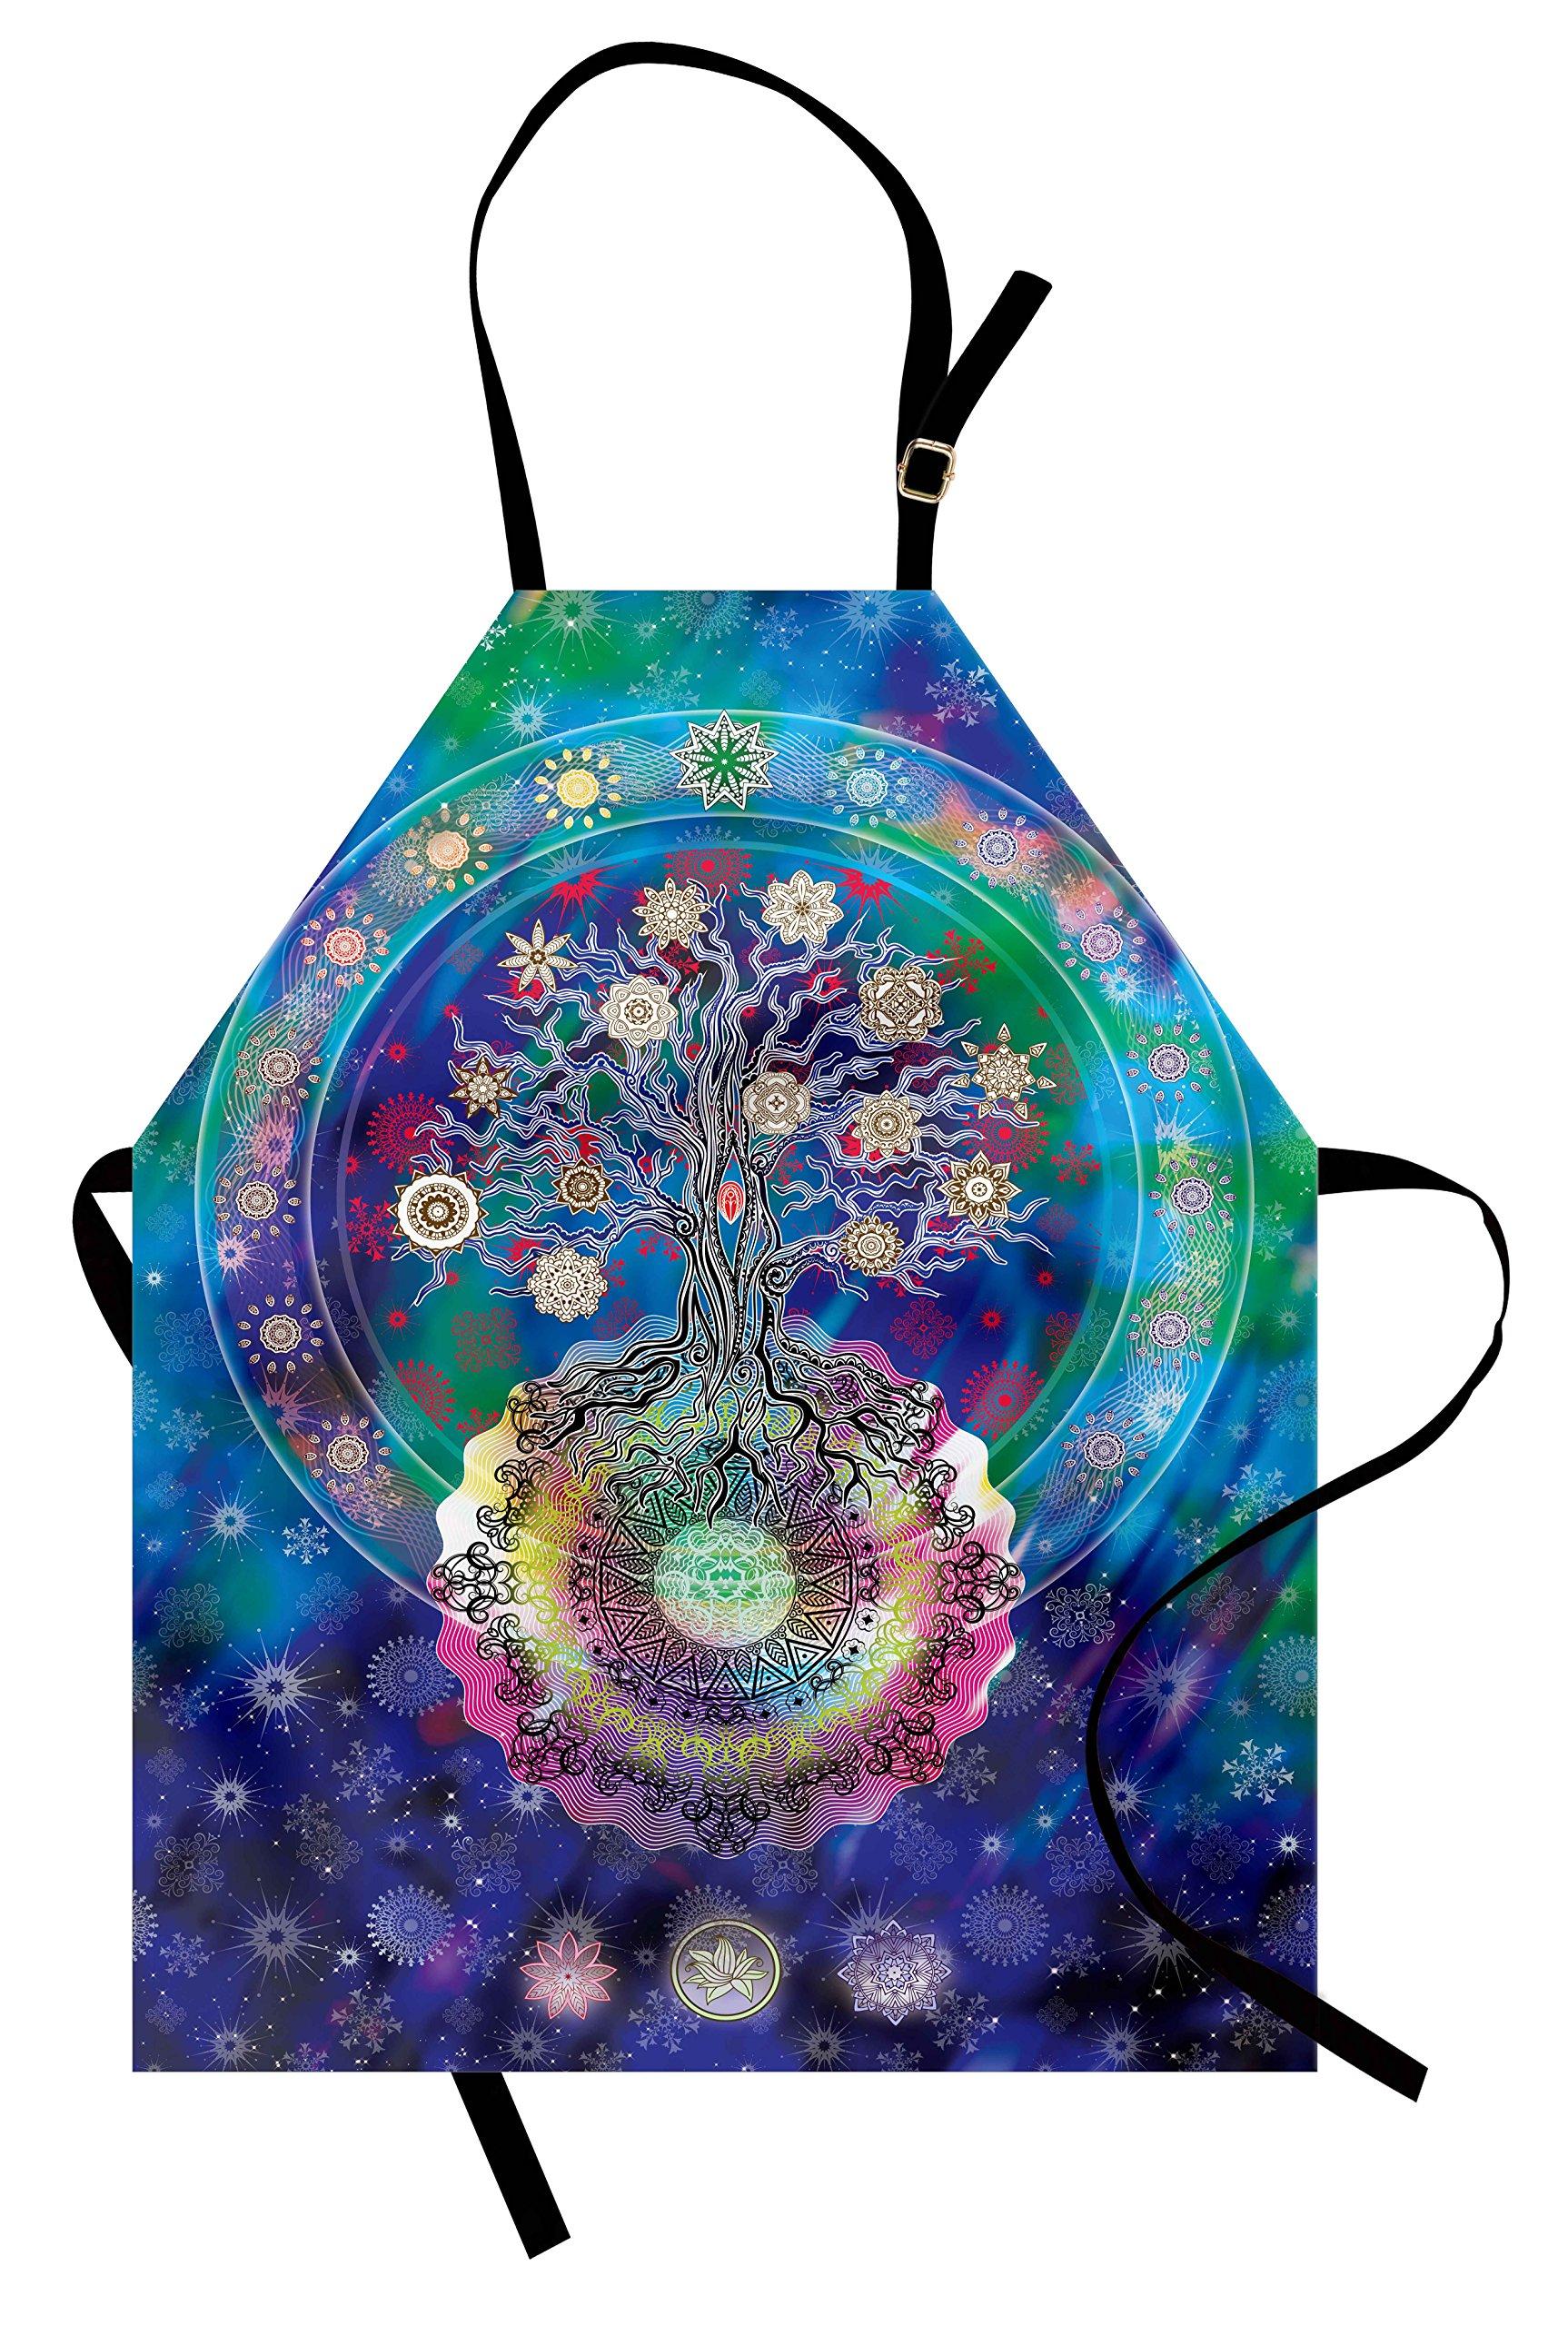 Lunarable Mandala Apron, Tree of Life Floral Style Mandala Spiritual Artwork Meditation Peace Spa Design, Unisex Kitchen Bib Apron with Adjustable Neck for Cooking Baking Gardening, Blue Purple